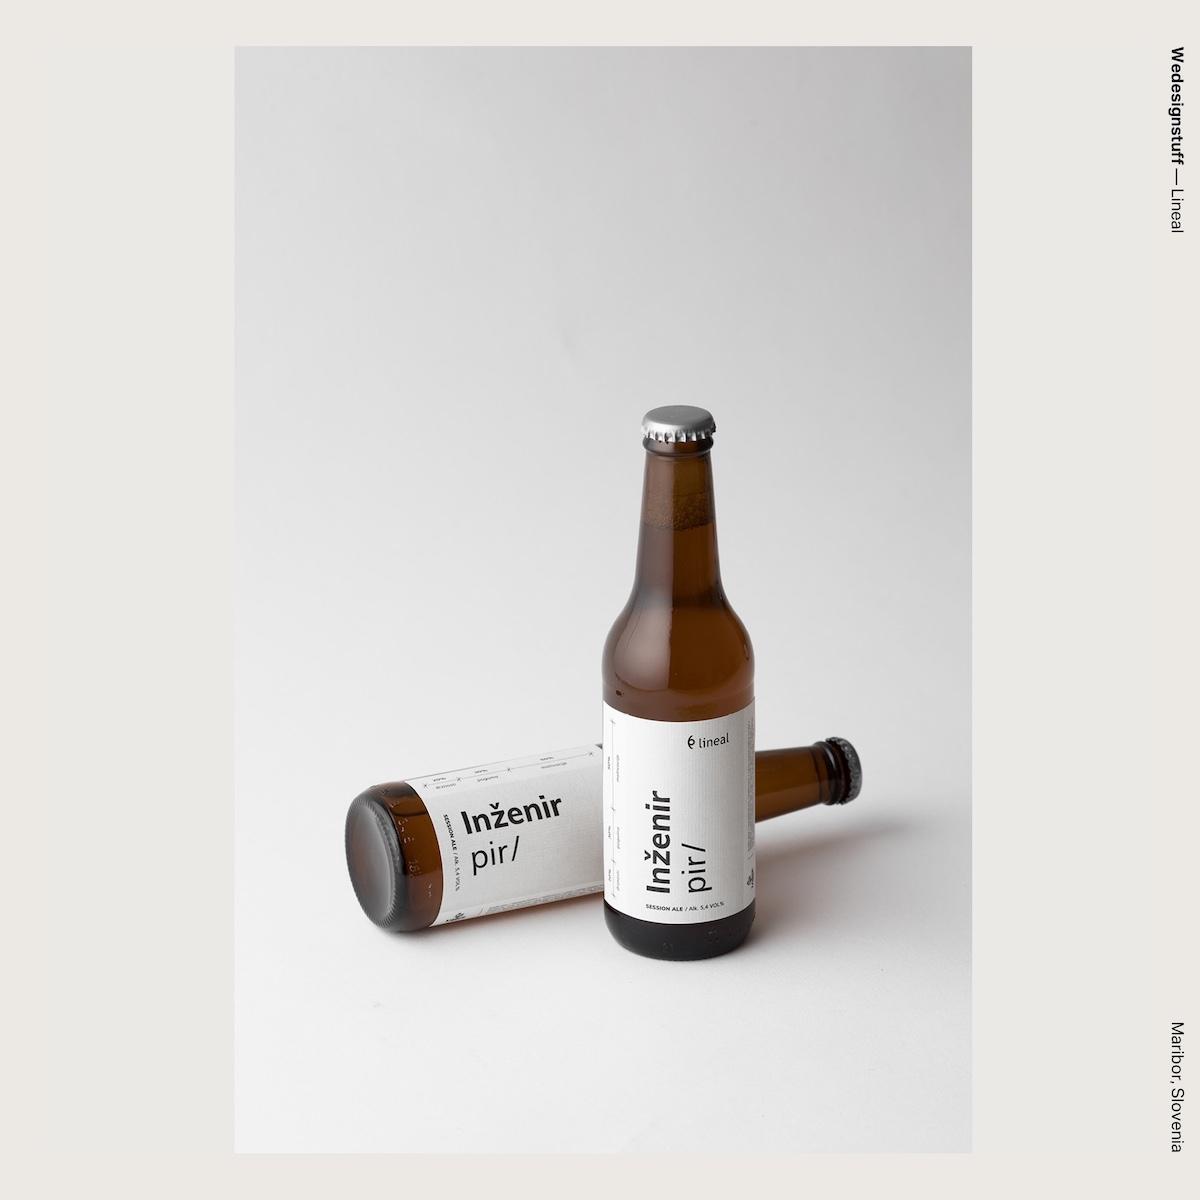 Wedesignstuff — Lineal